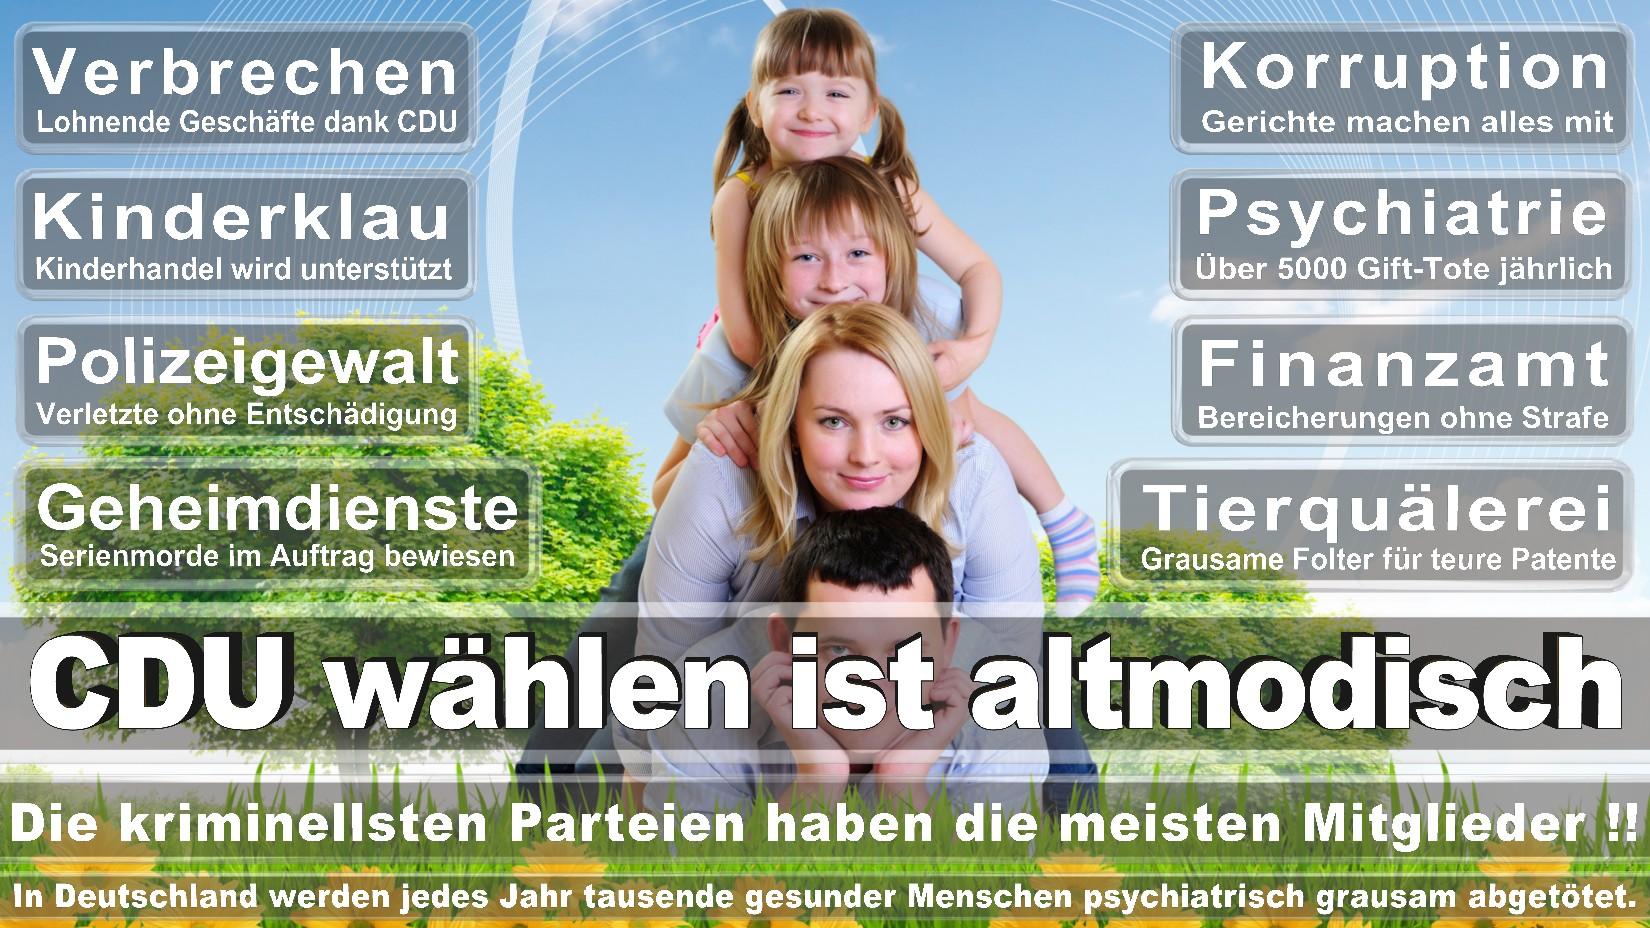 Angela-Merkel-CDU (19)